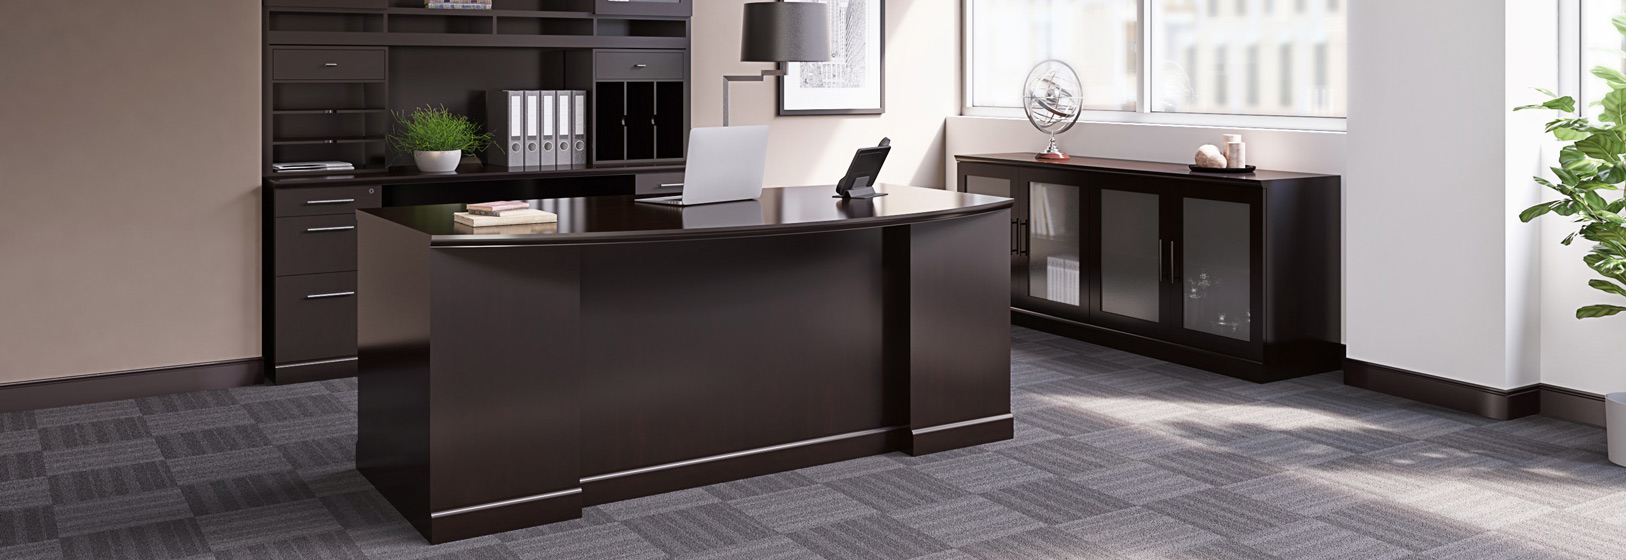 Professional Desks and Workstations  BSOSC  Charleston SC